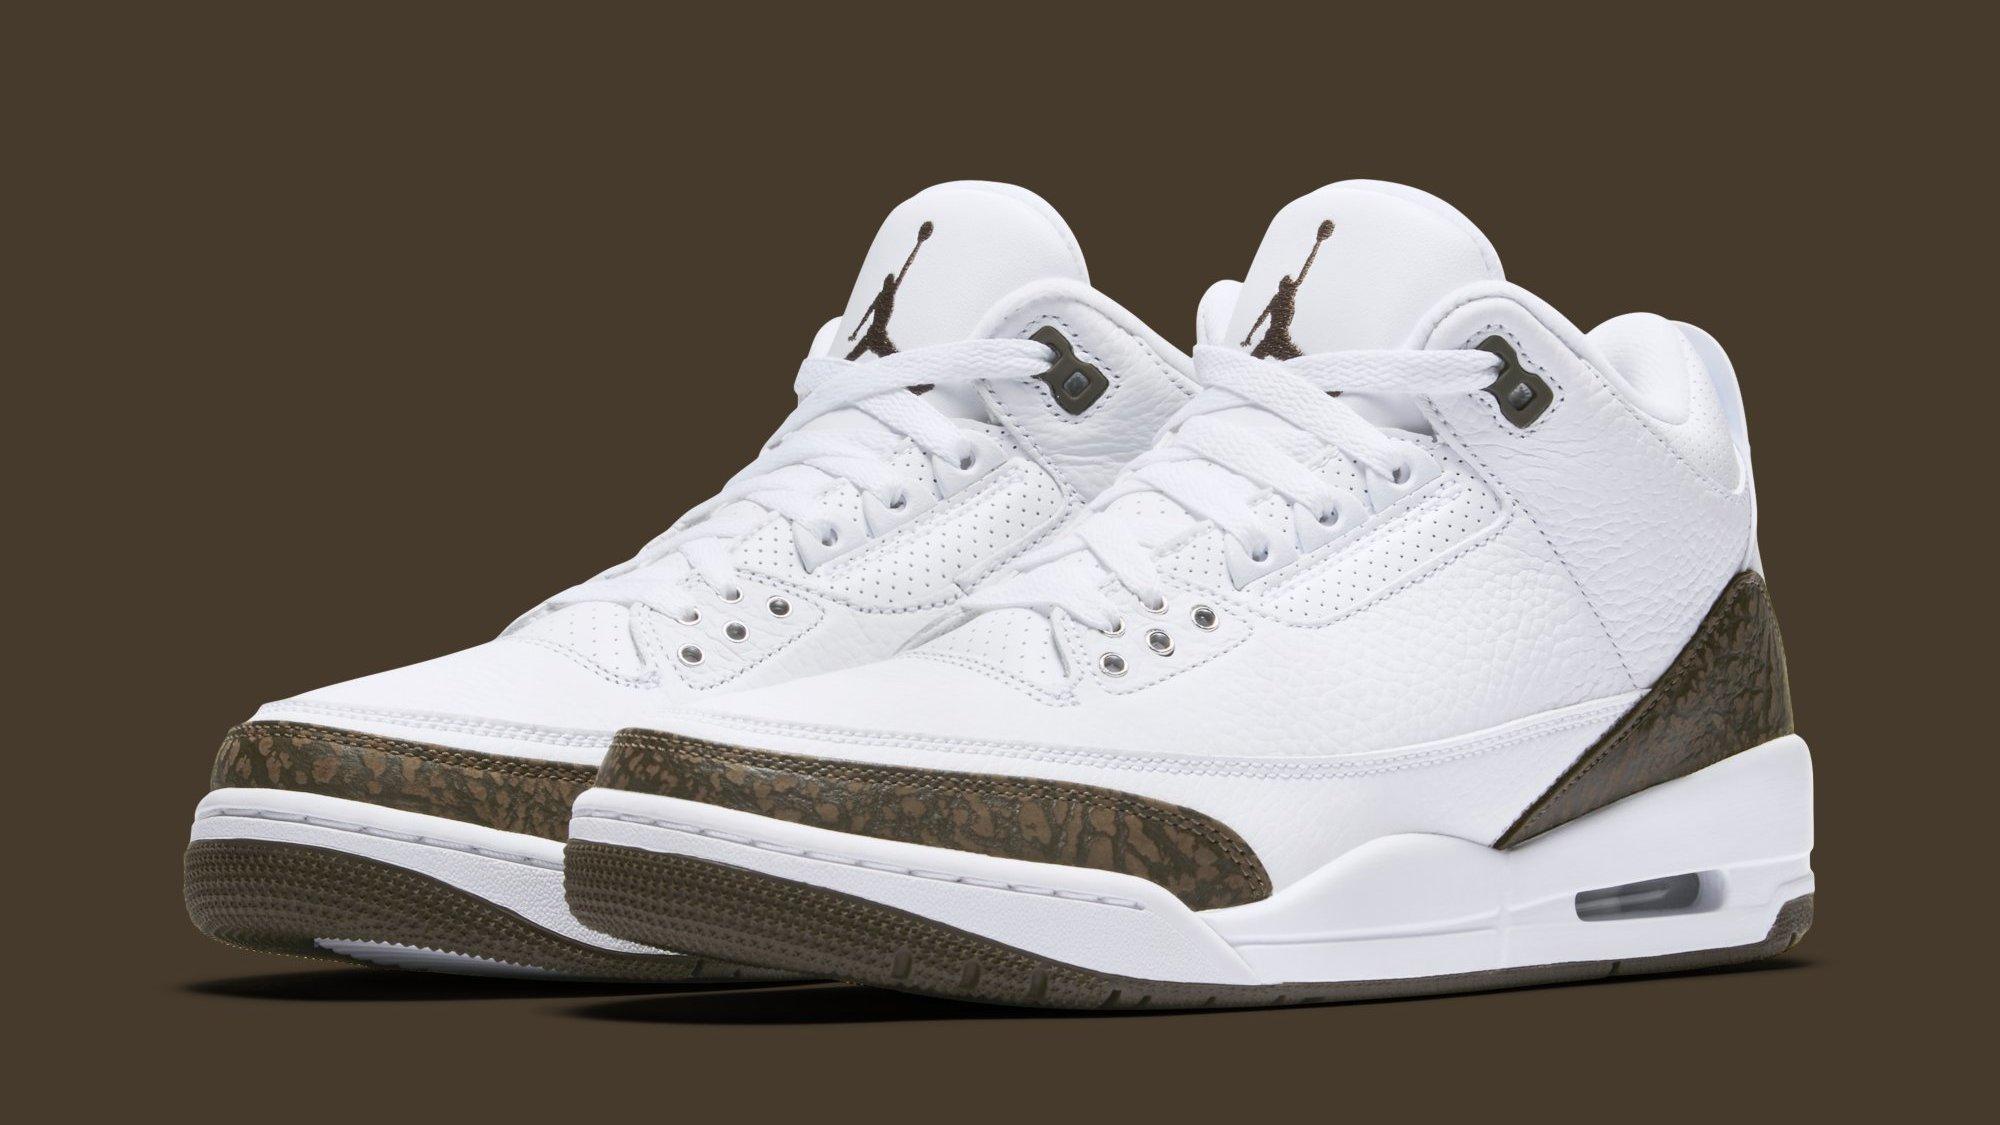 Air Jordan 3 'Mocha' Release Date December 2018 136064-122   Sole ...